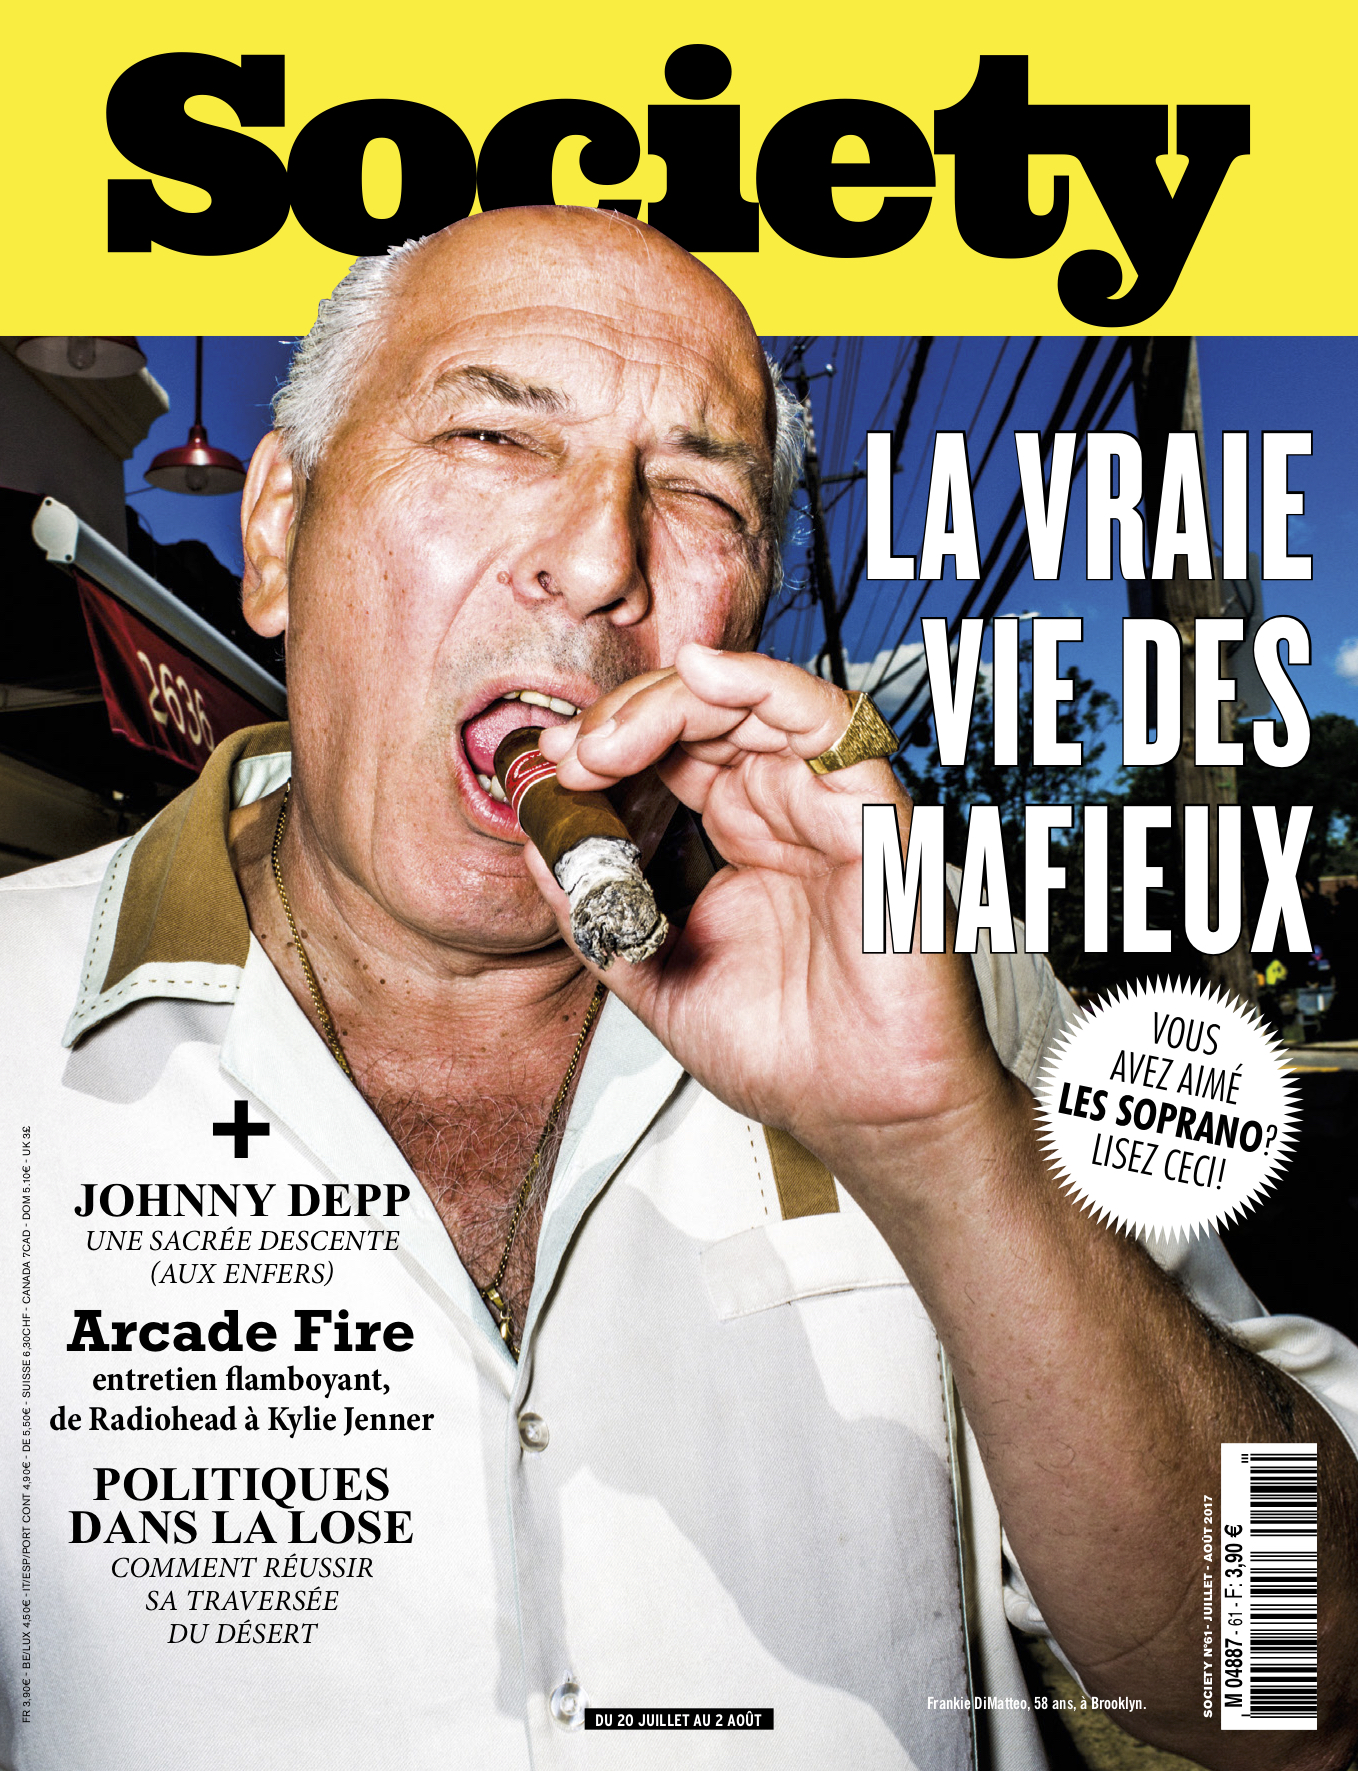 Former mob bosses, hitmen, and informants for Society Magazine